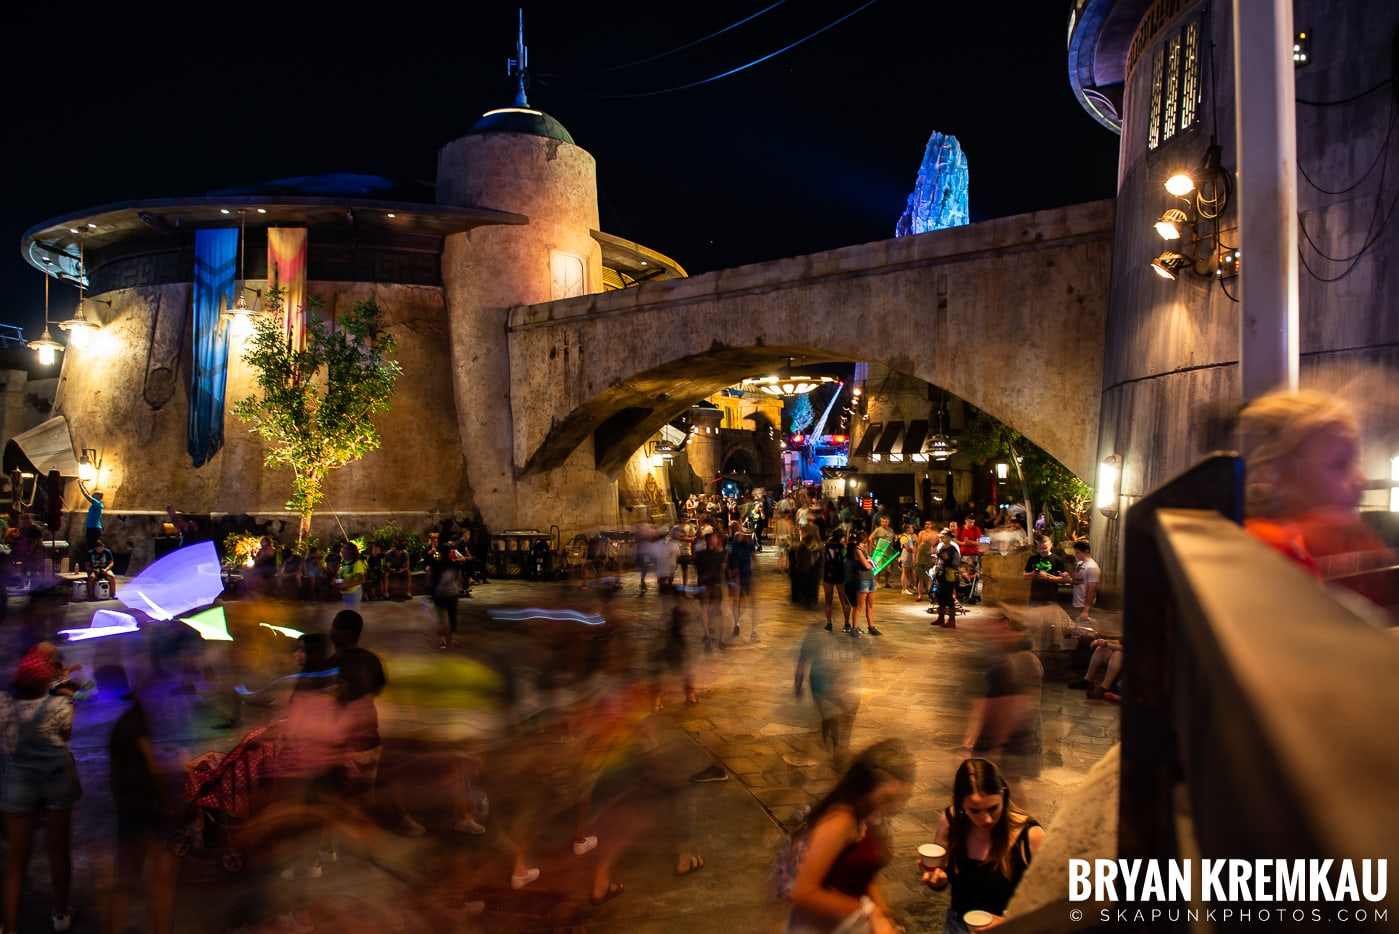 Walt Disney World Vacation: Day 6 (Magic Kingdom, Epcot, Disney's Hollywood Studios) - 10.4.19 (17)